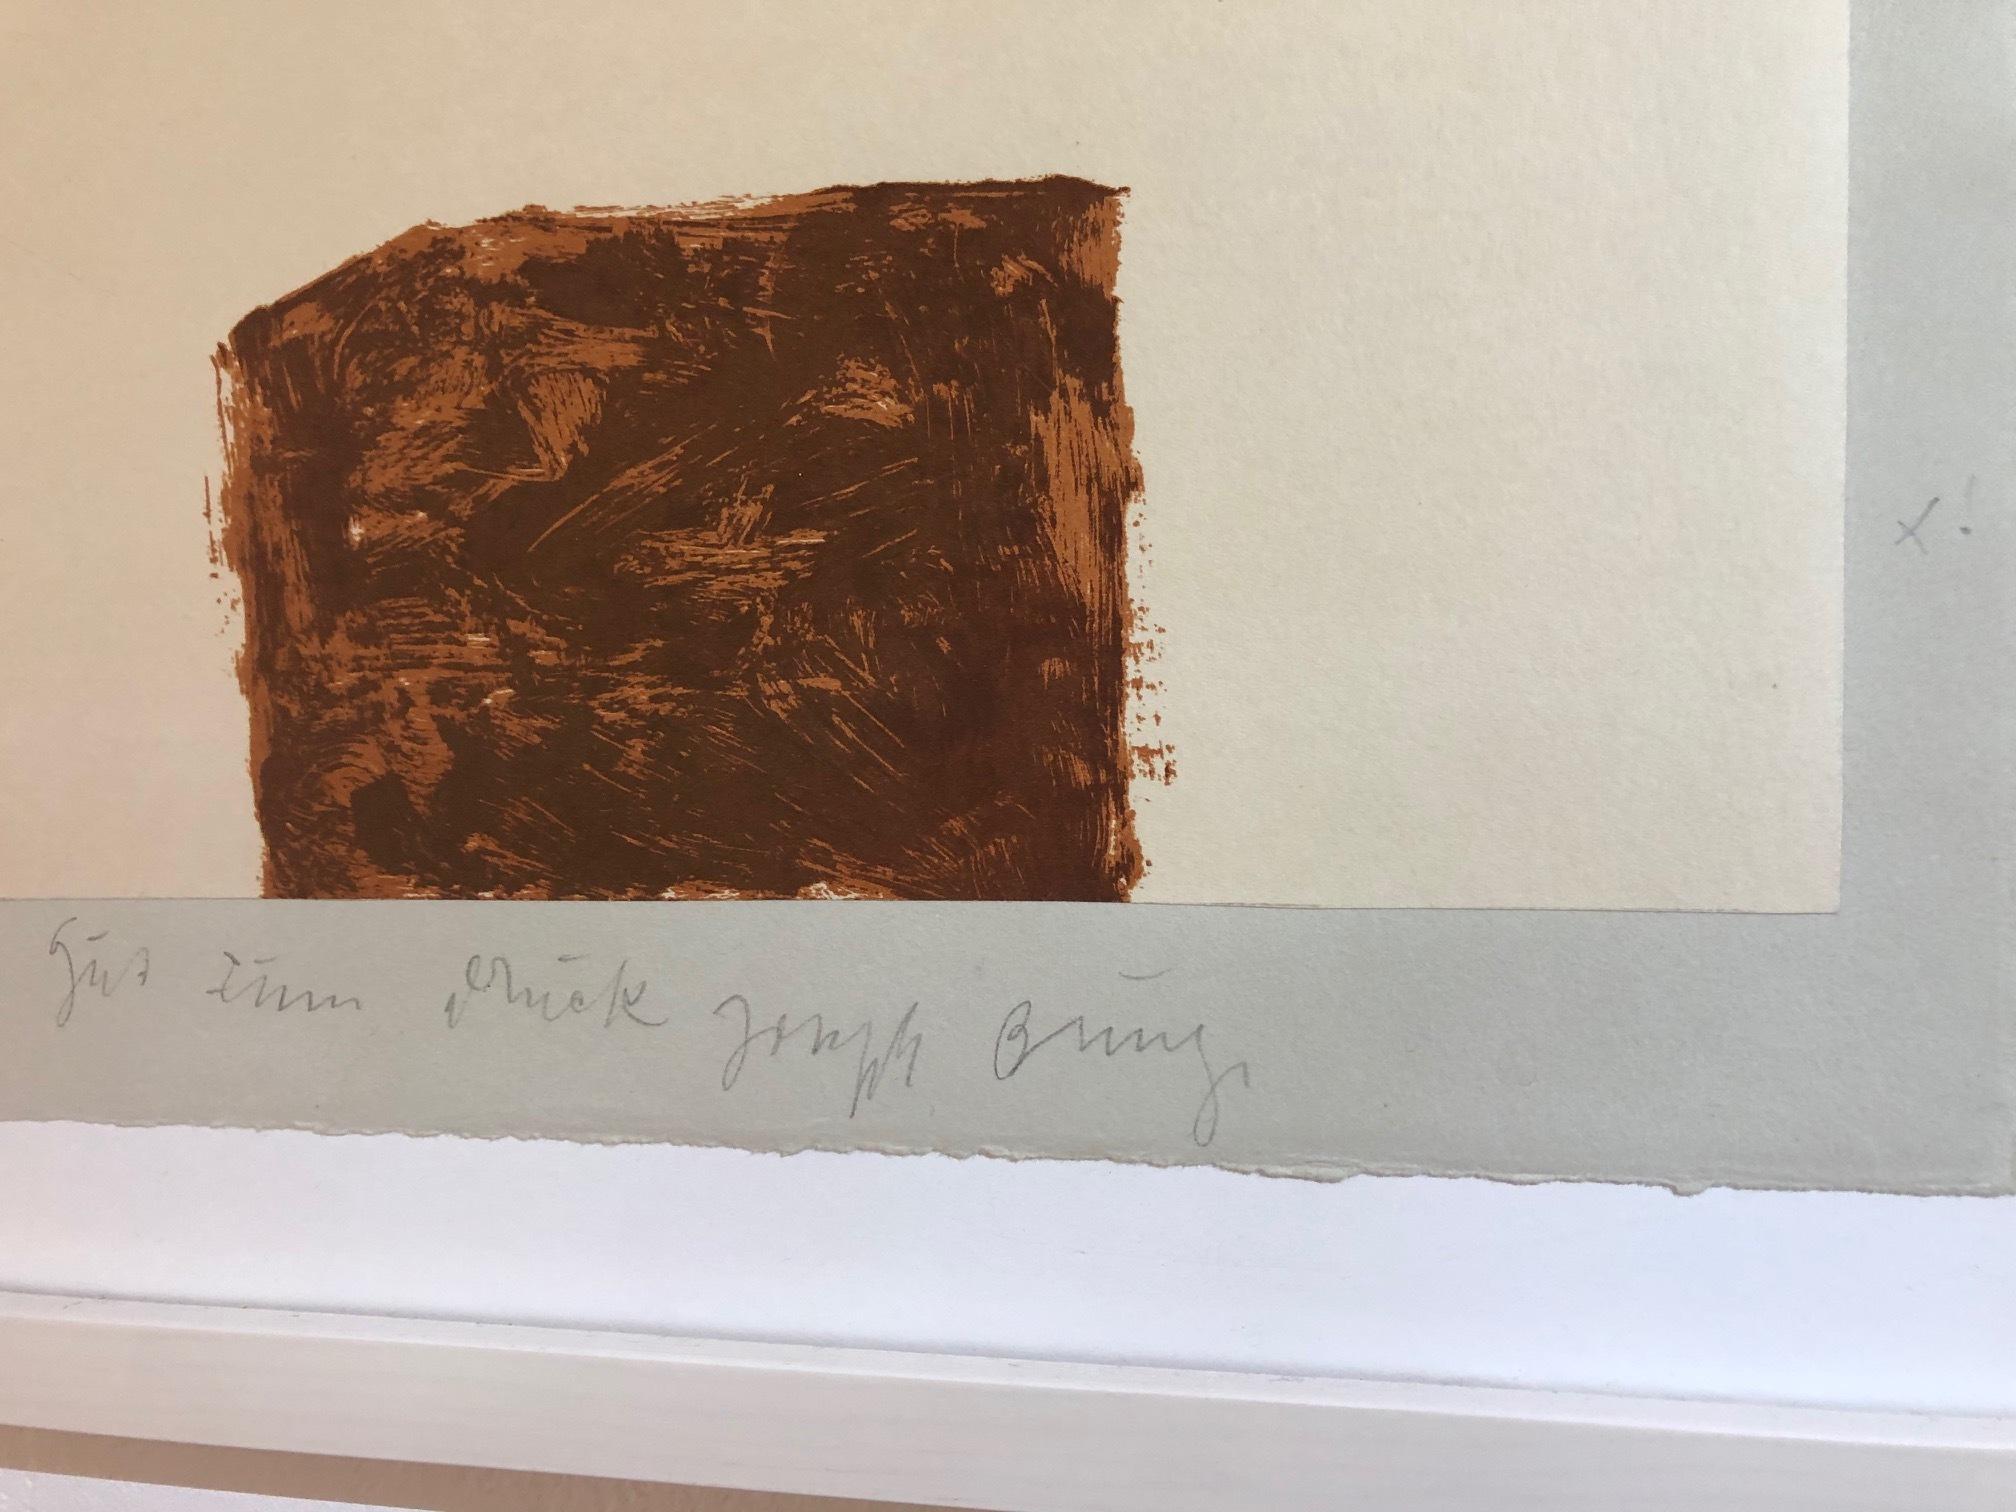 Joseph Beuys - Suite Schwurhand - Wandernde Kiste 4 2/2